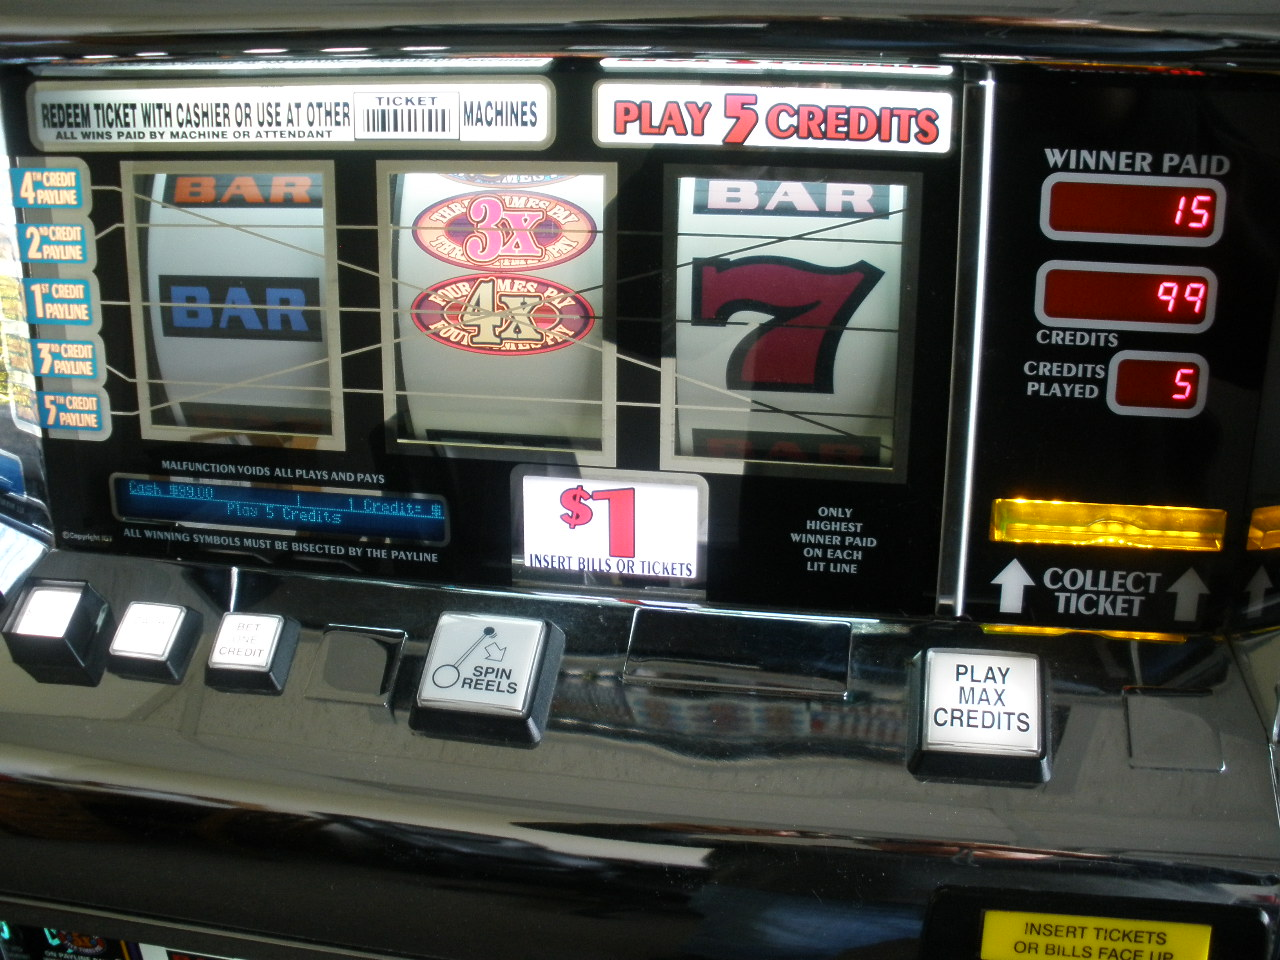 Royal ace casino $100 no deposit bonus codes 2020